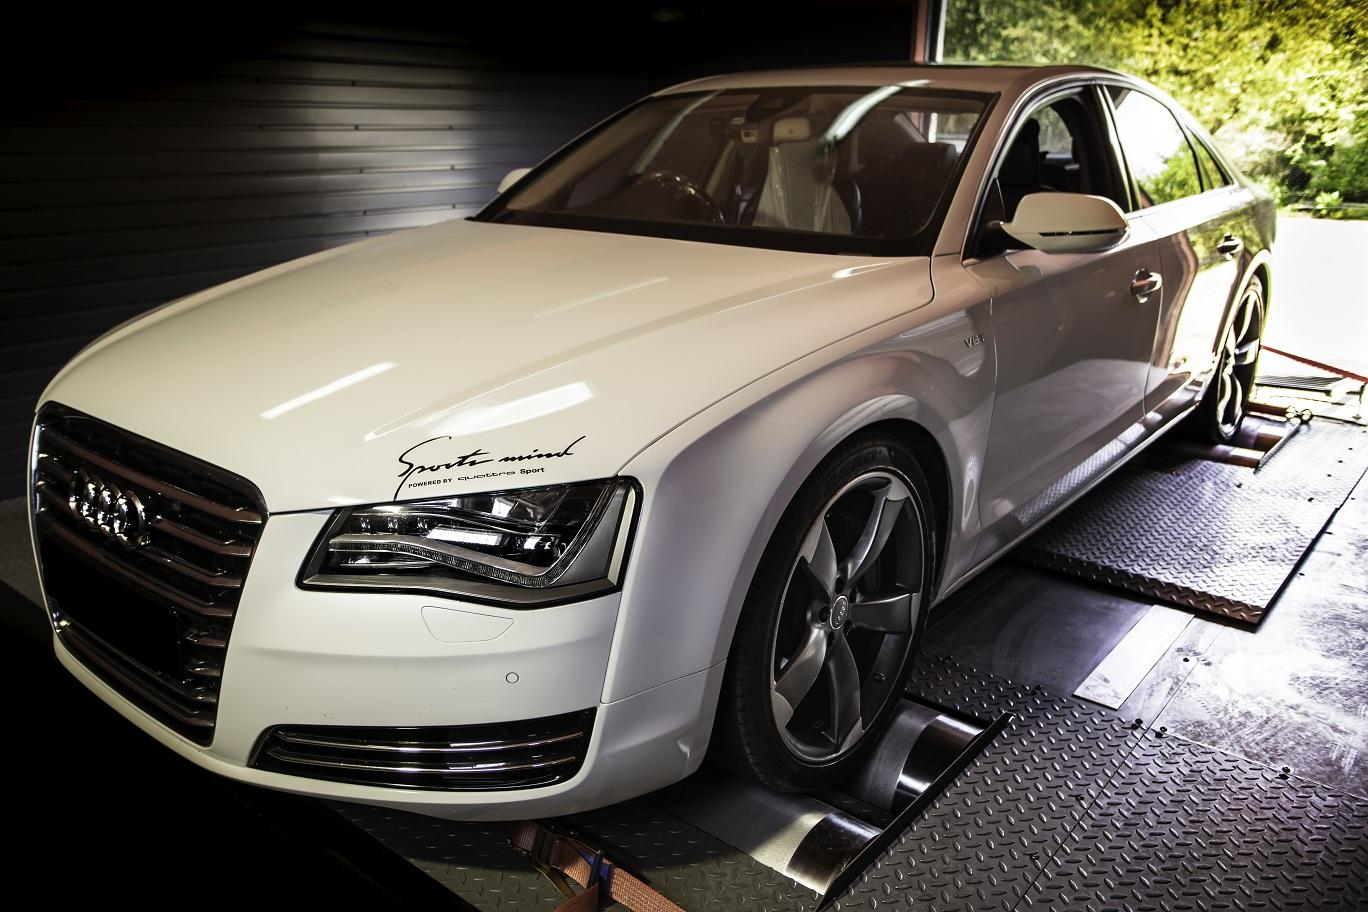 Audi-A8-4.2-TDI-s-performance